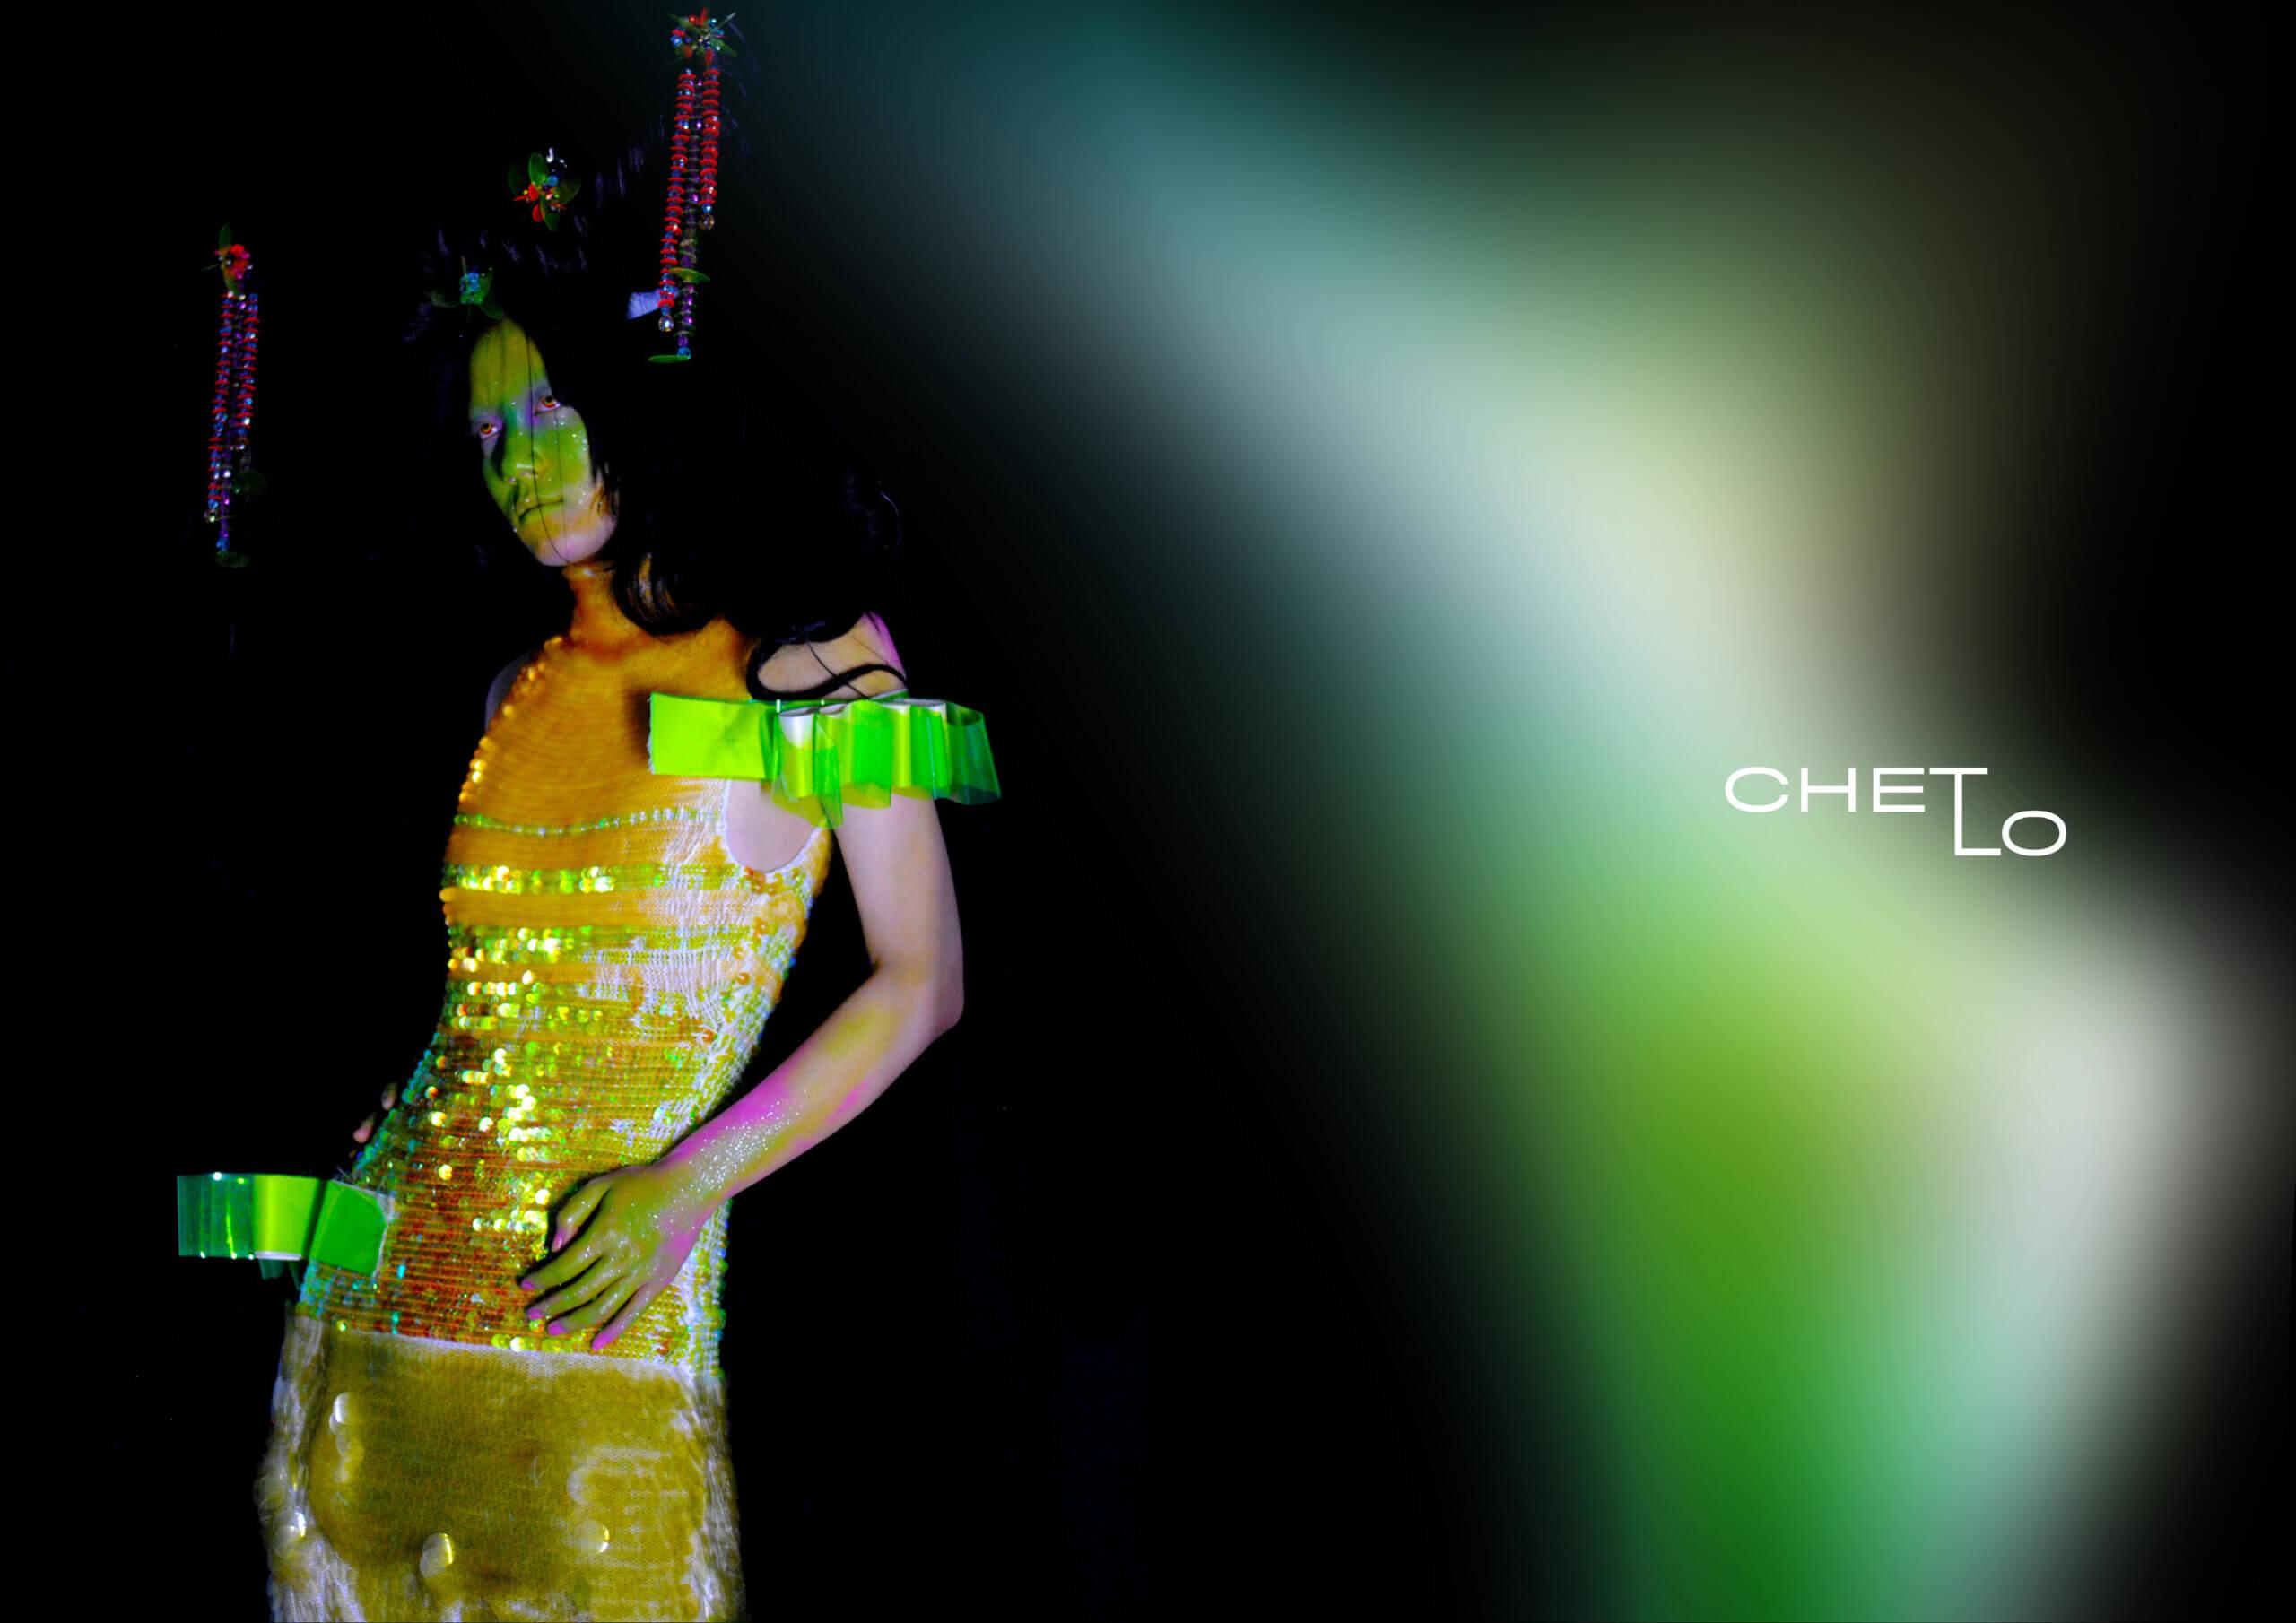 lo_chet_5